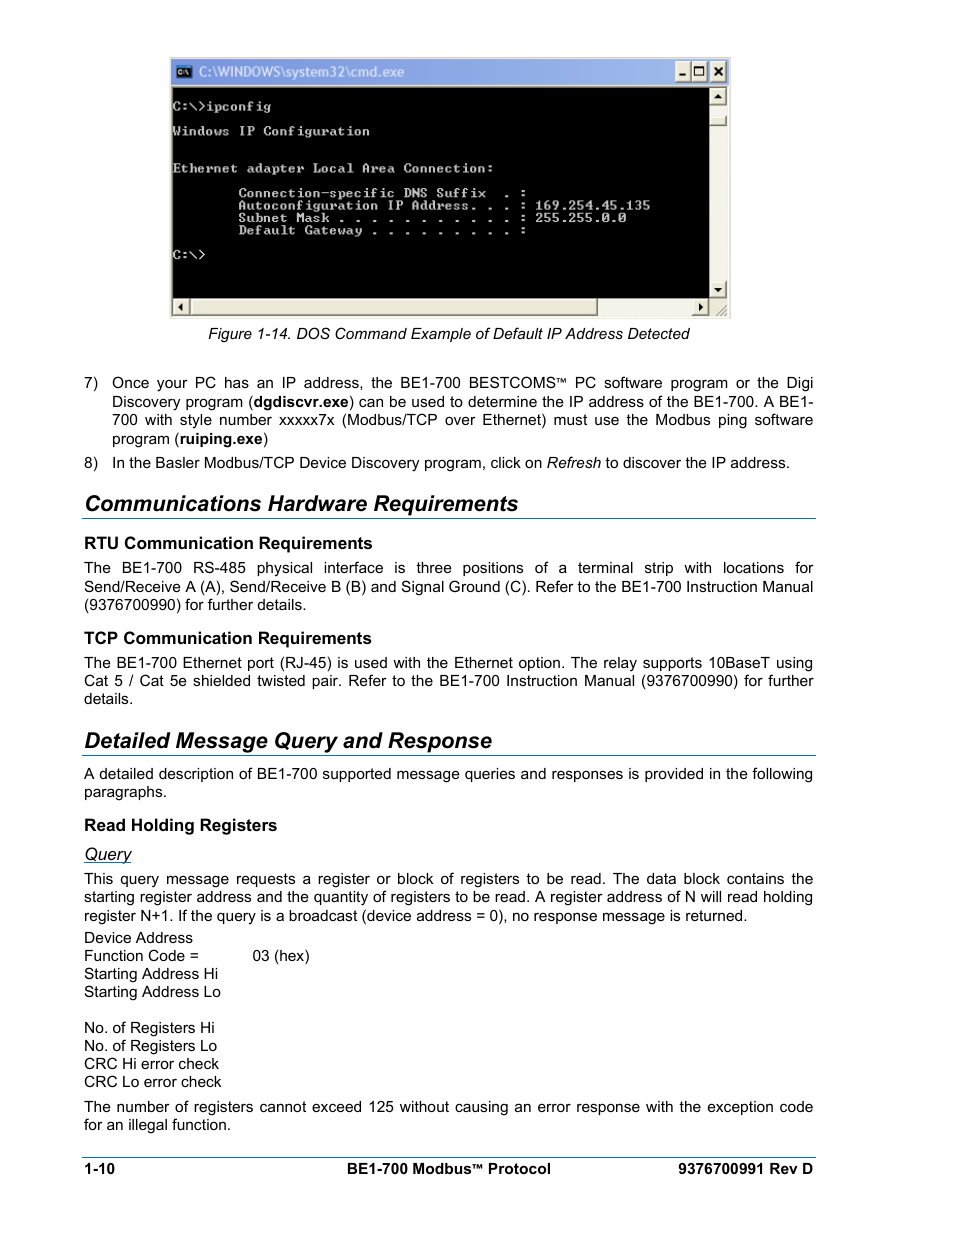 Communications hardware requirements, Rtu communication